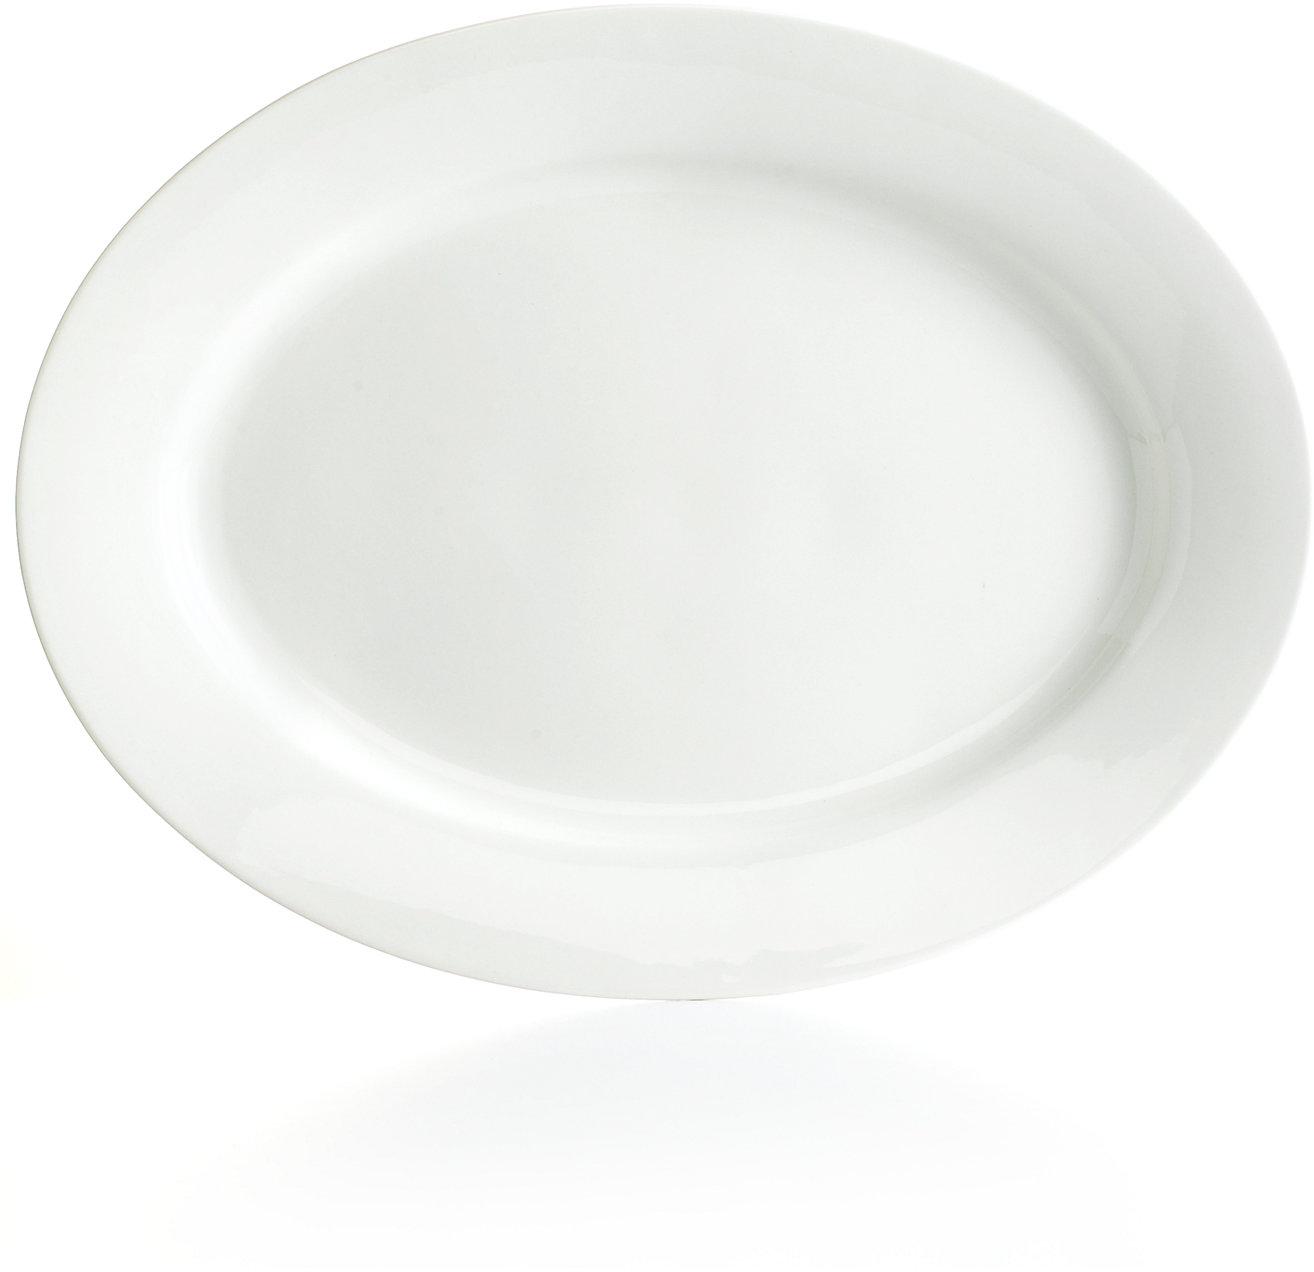 Martha Stewart Collection Whiteware Oval Platter - Serveware - Dining & Entertaining - Macy's